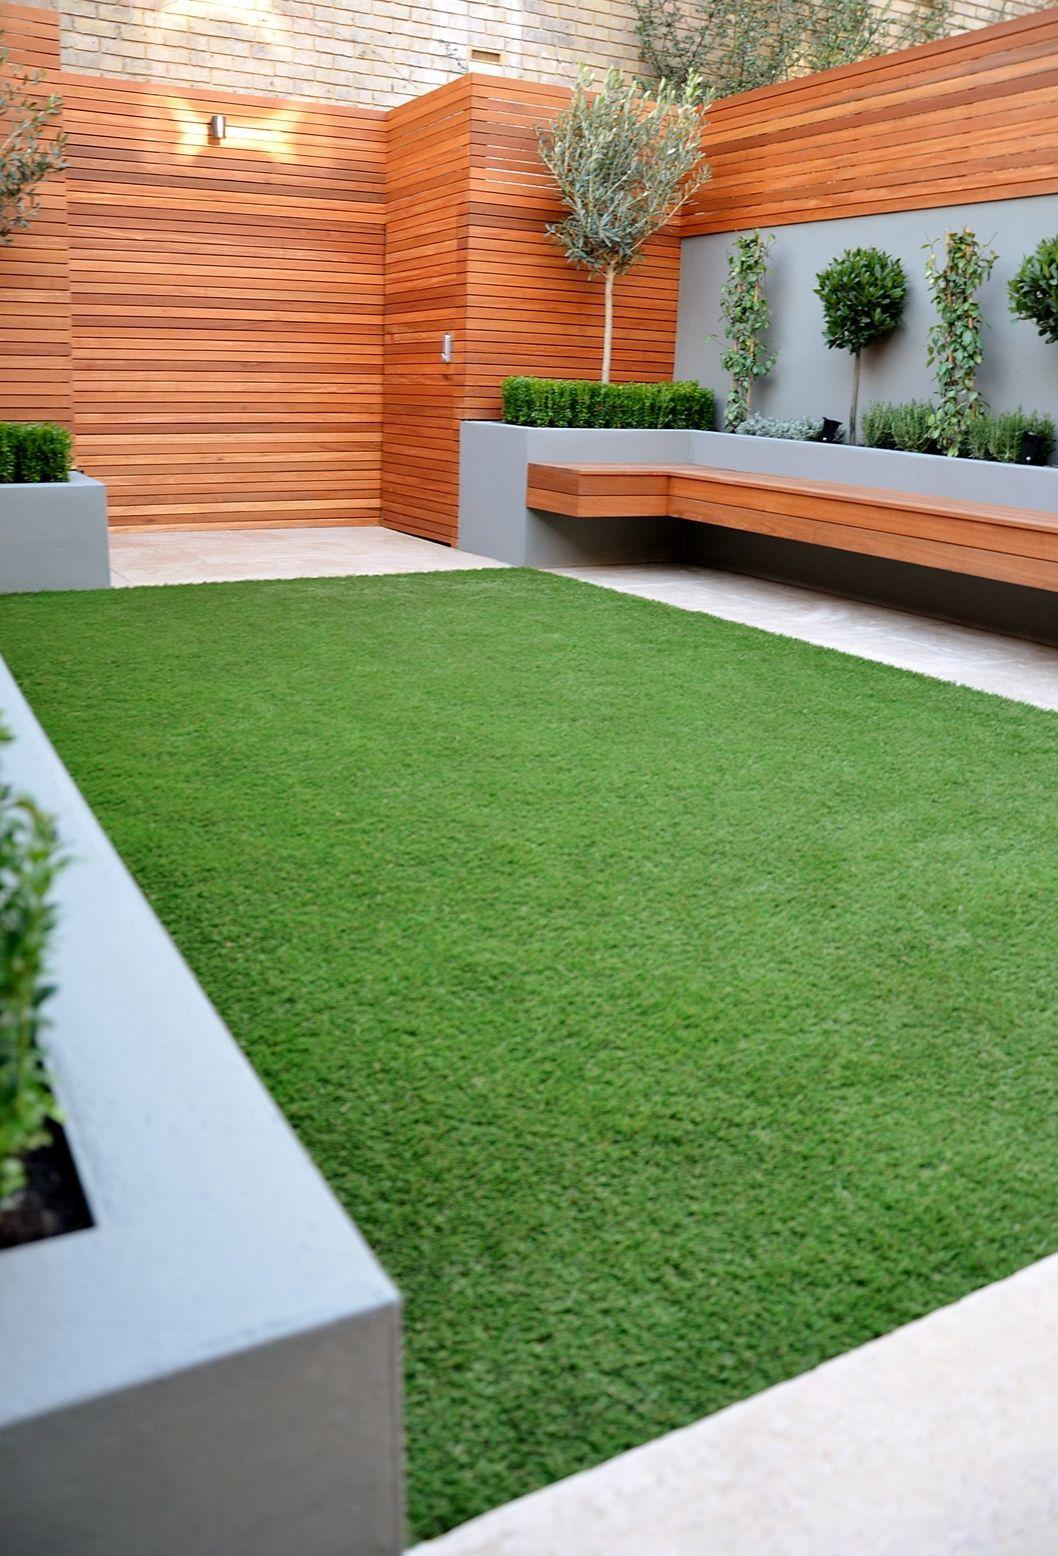 13 garden design Modern house ideas